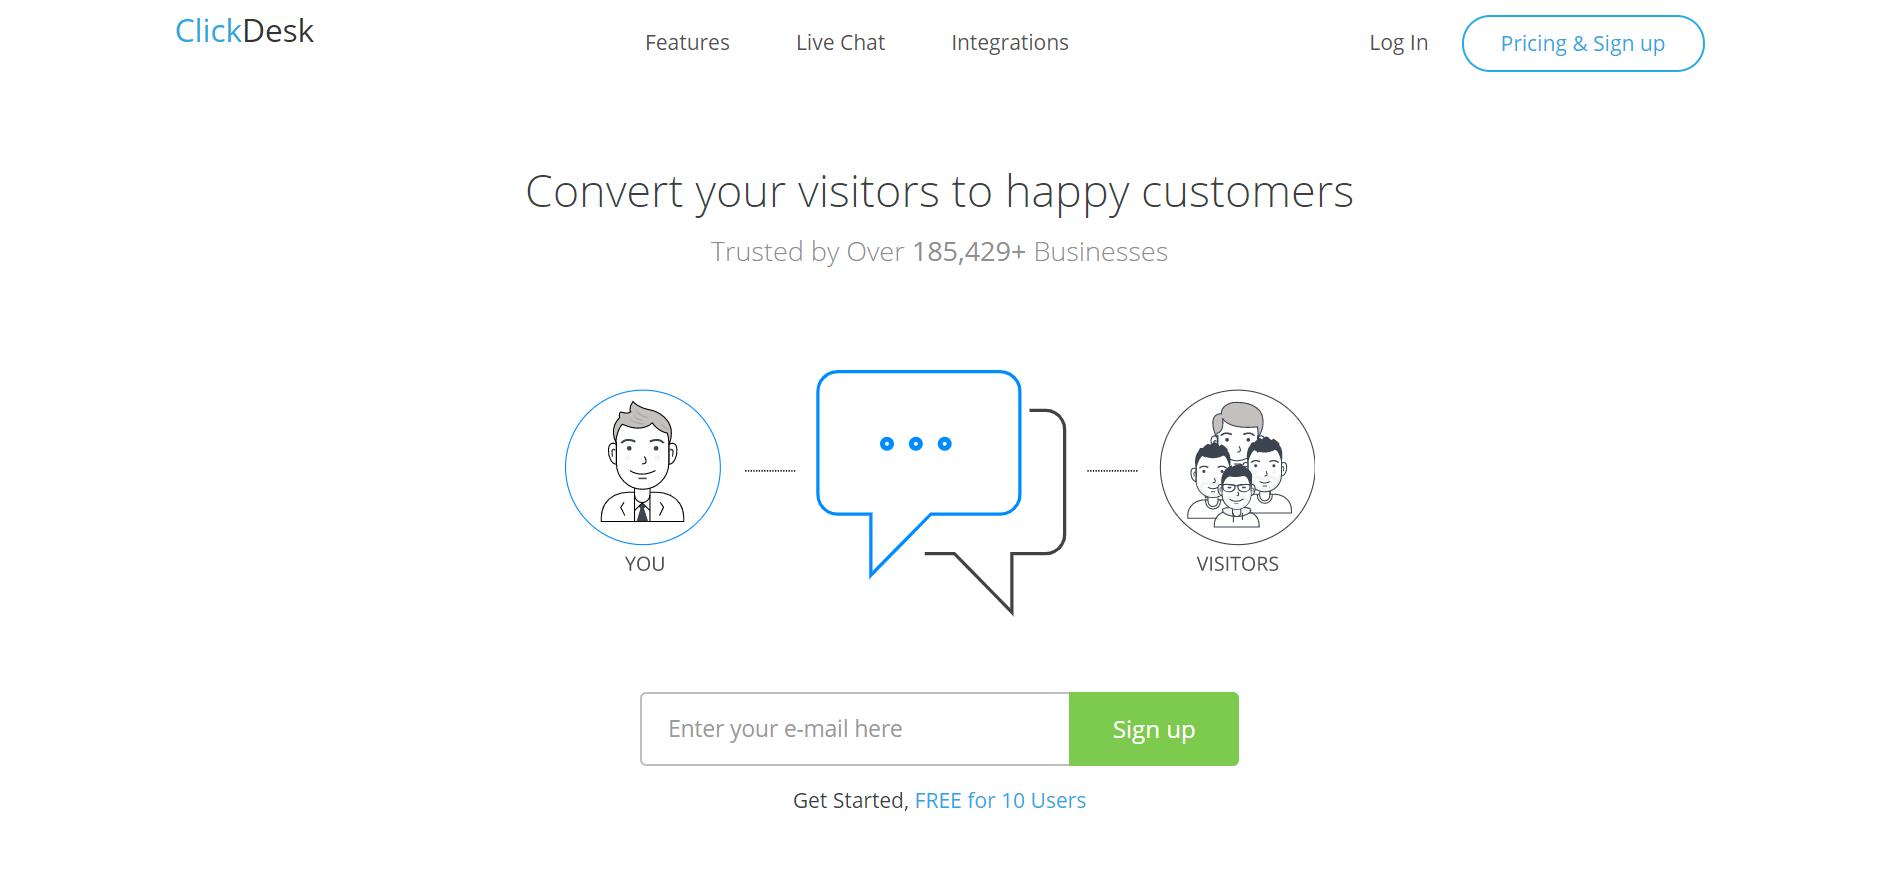 best live chat software - ClickDesk